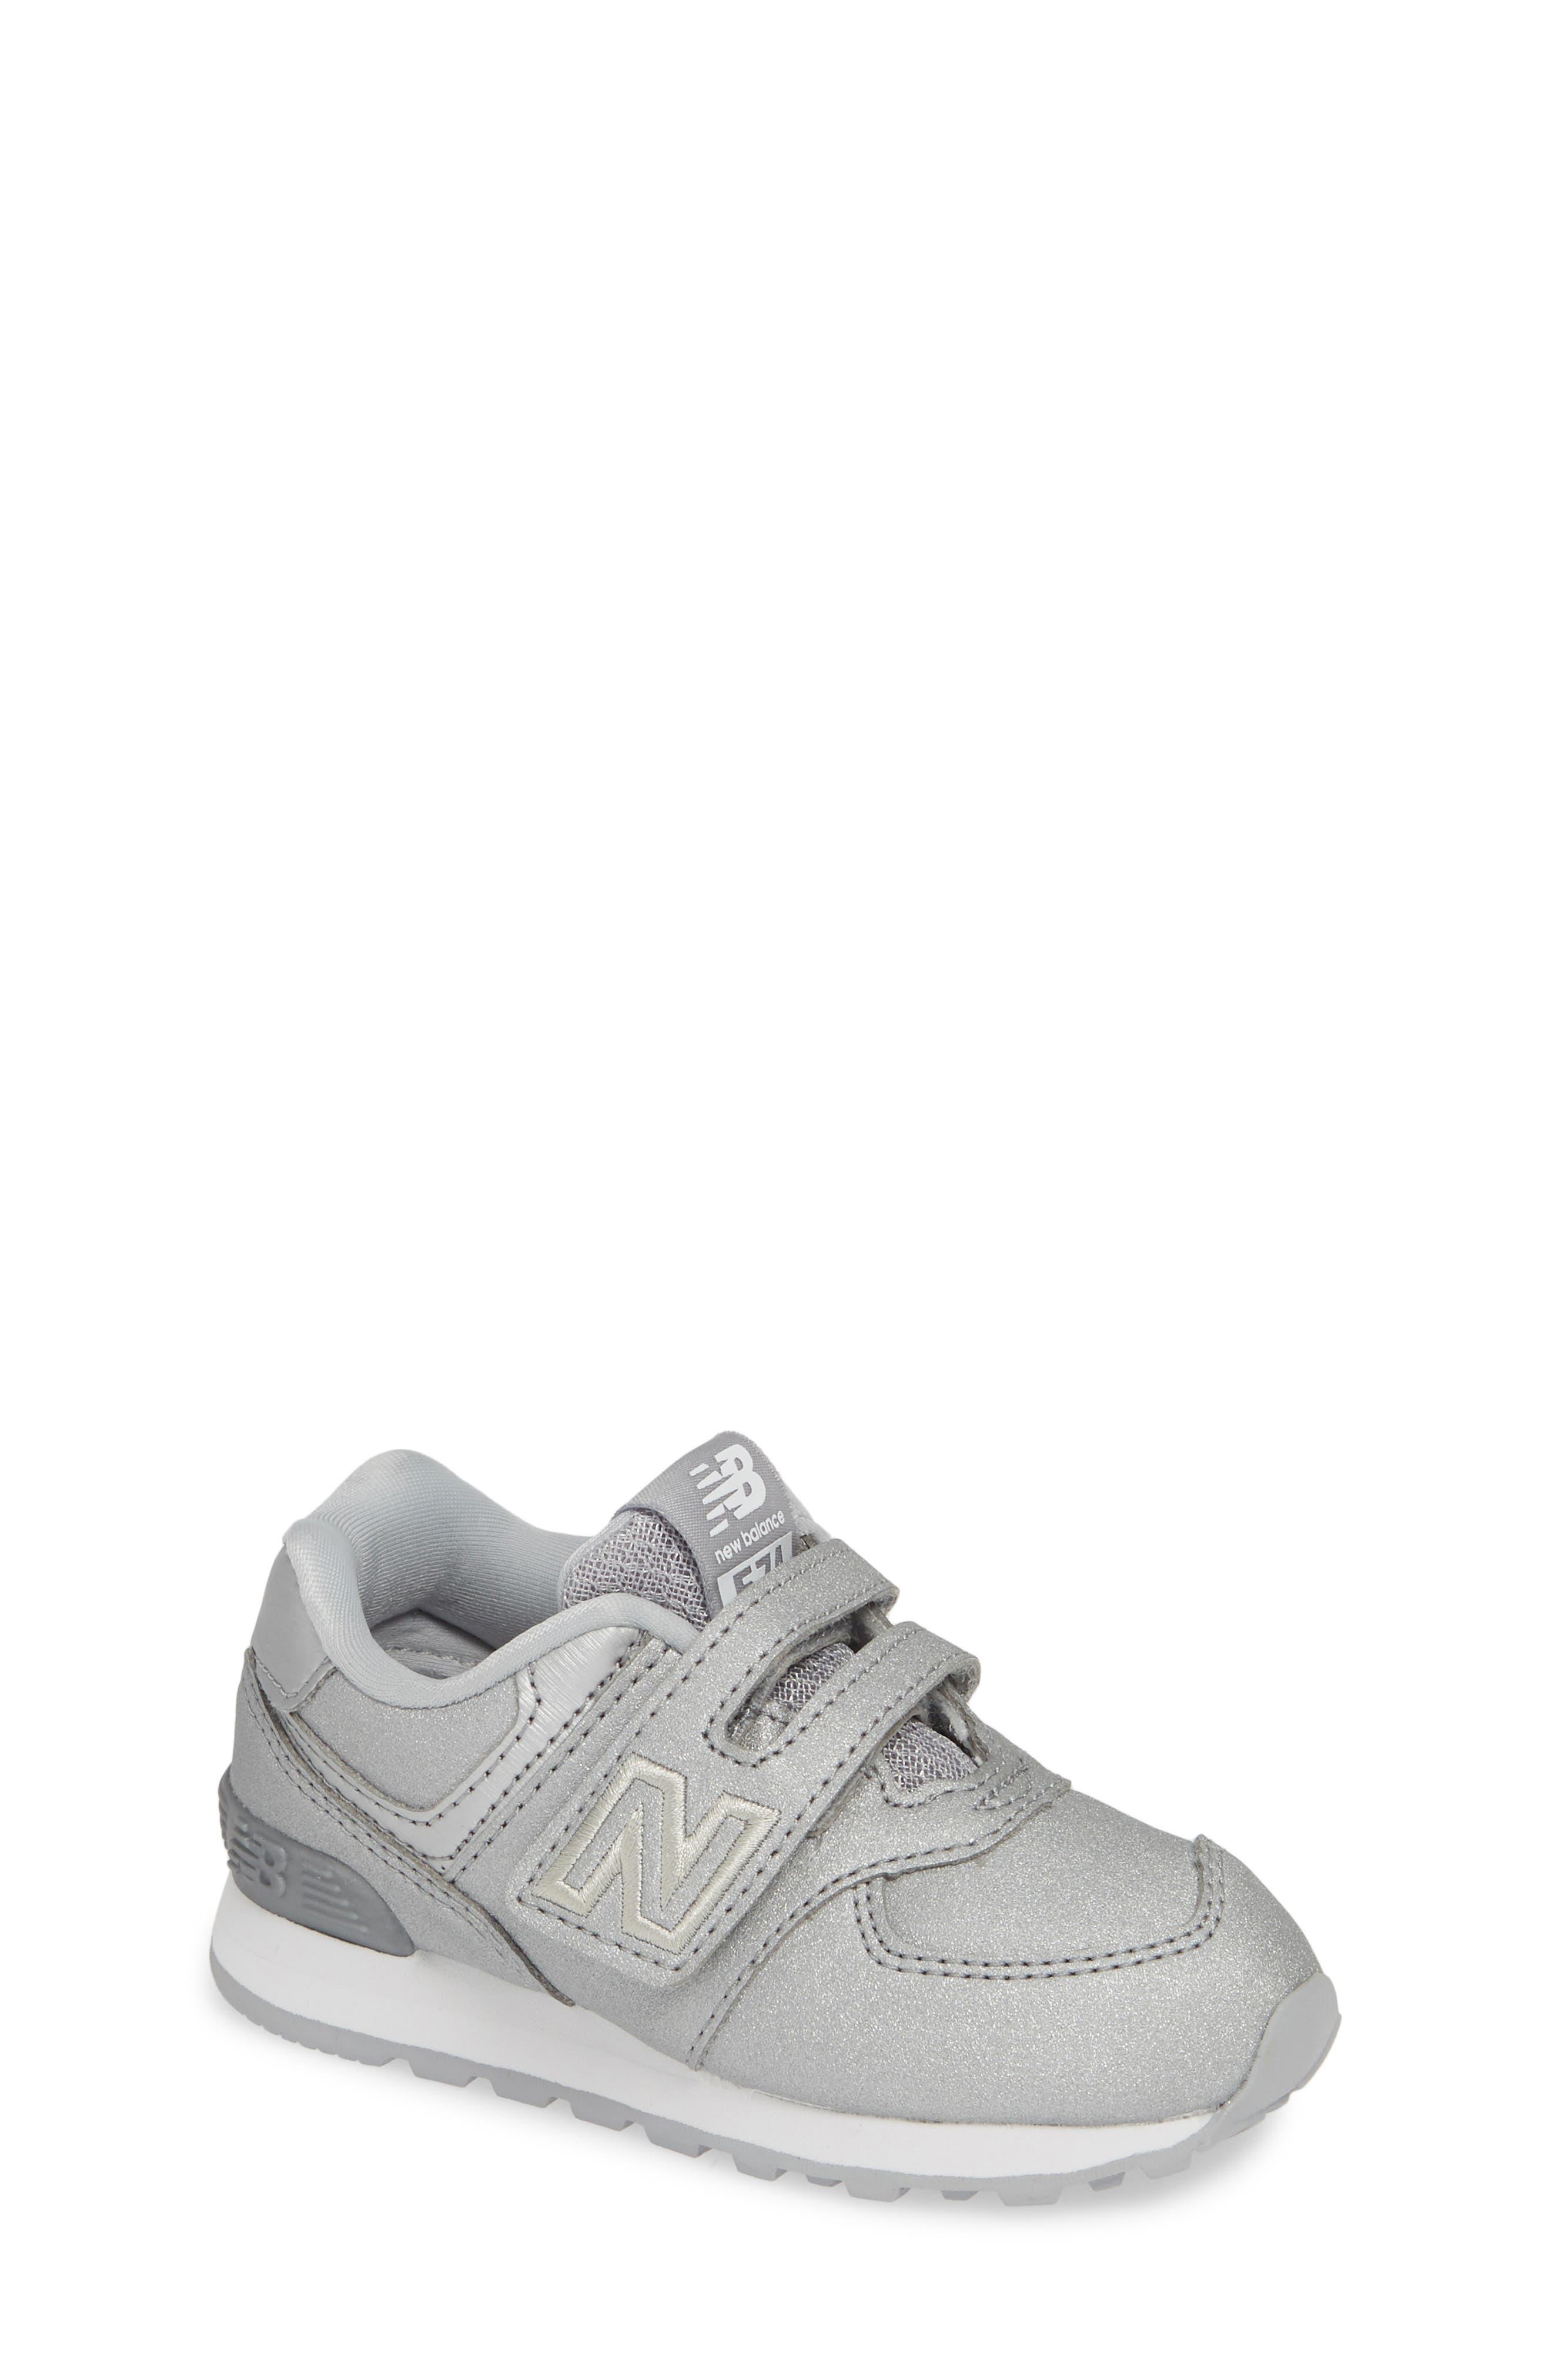 574 Essentials Glitter Sneaker,                             Main thumbnail 1, color,                             SILVER